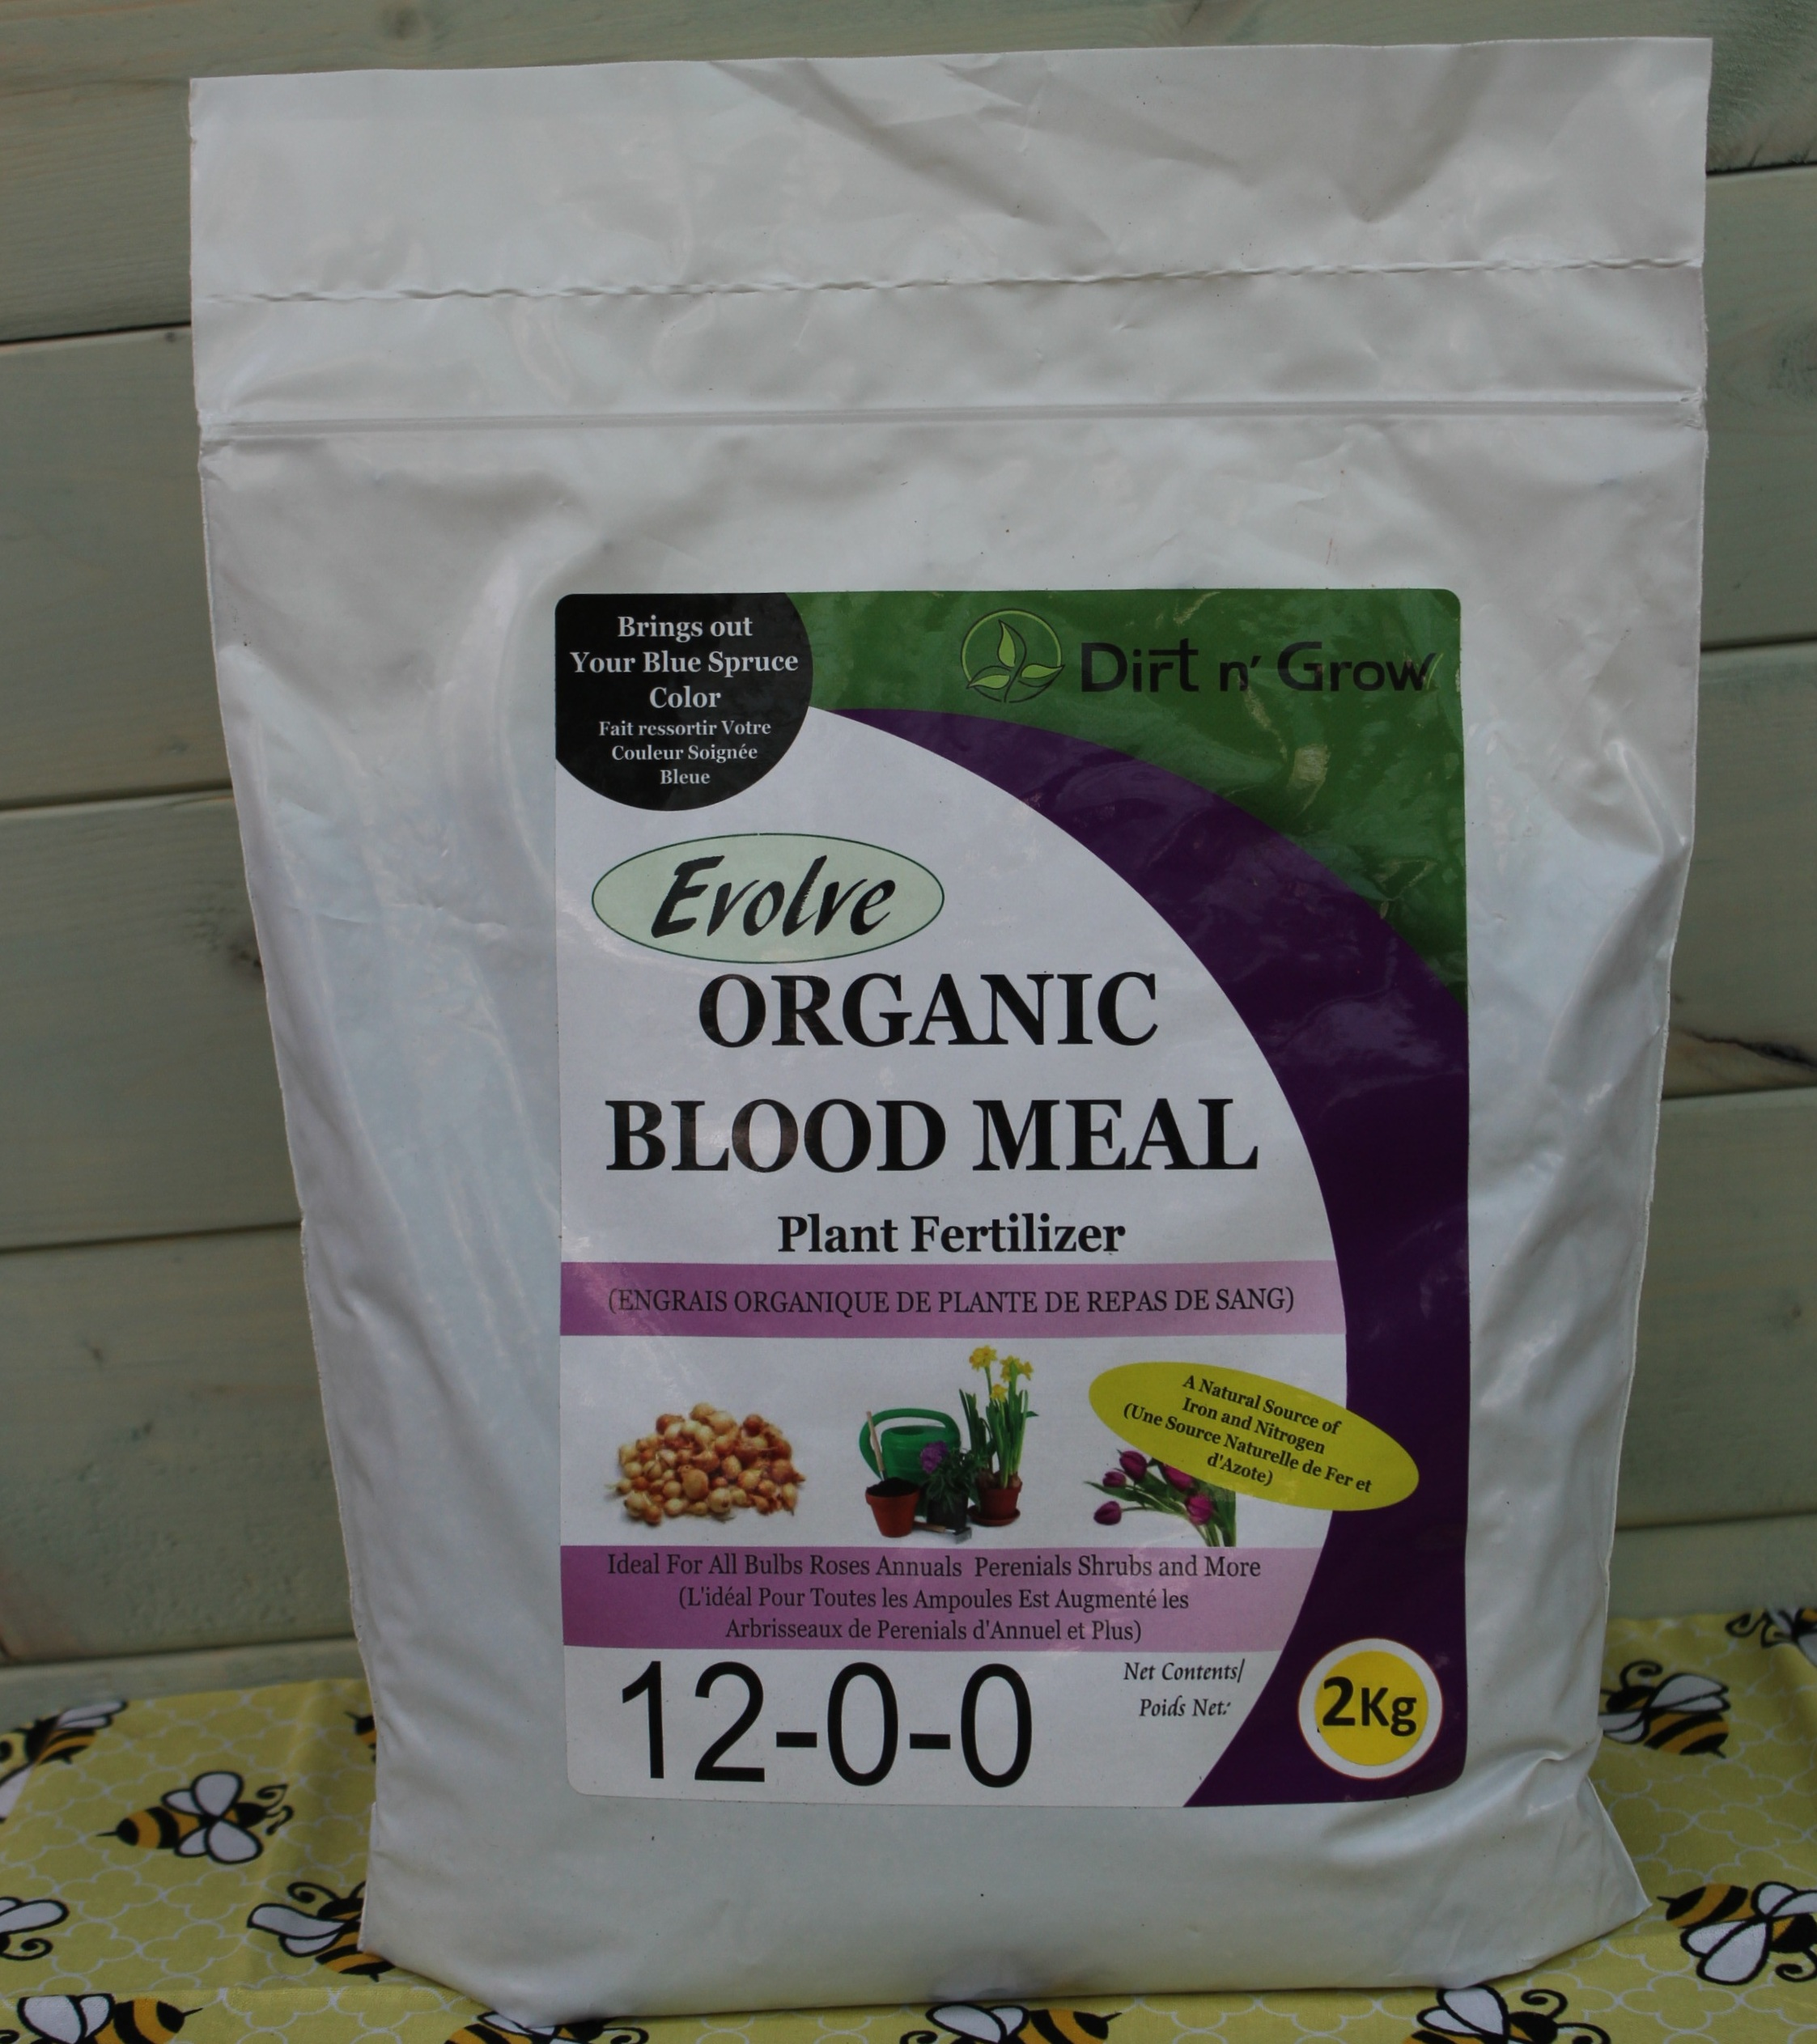 ORGANIC BLOOD MEAL